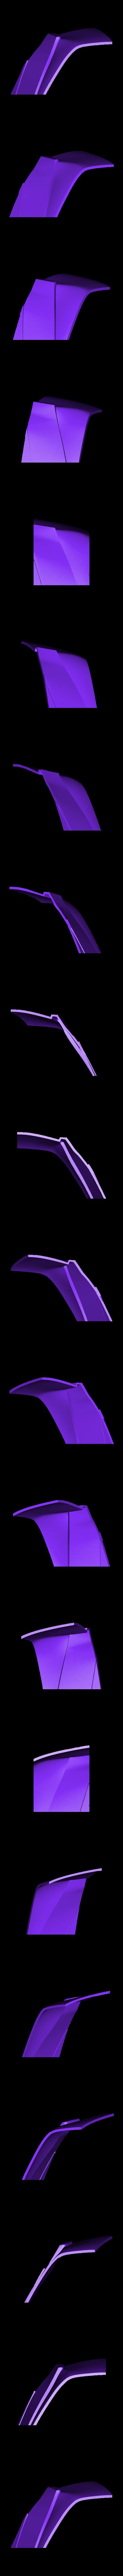 Part_4_v2.stl Download free STL file Battlestar Galactica Colonial Viper Pilot Helmet • 3D printing object, VillainousPropShop